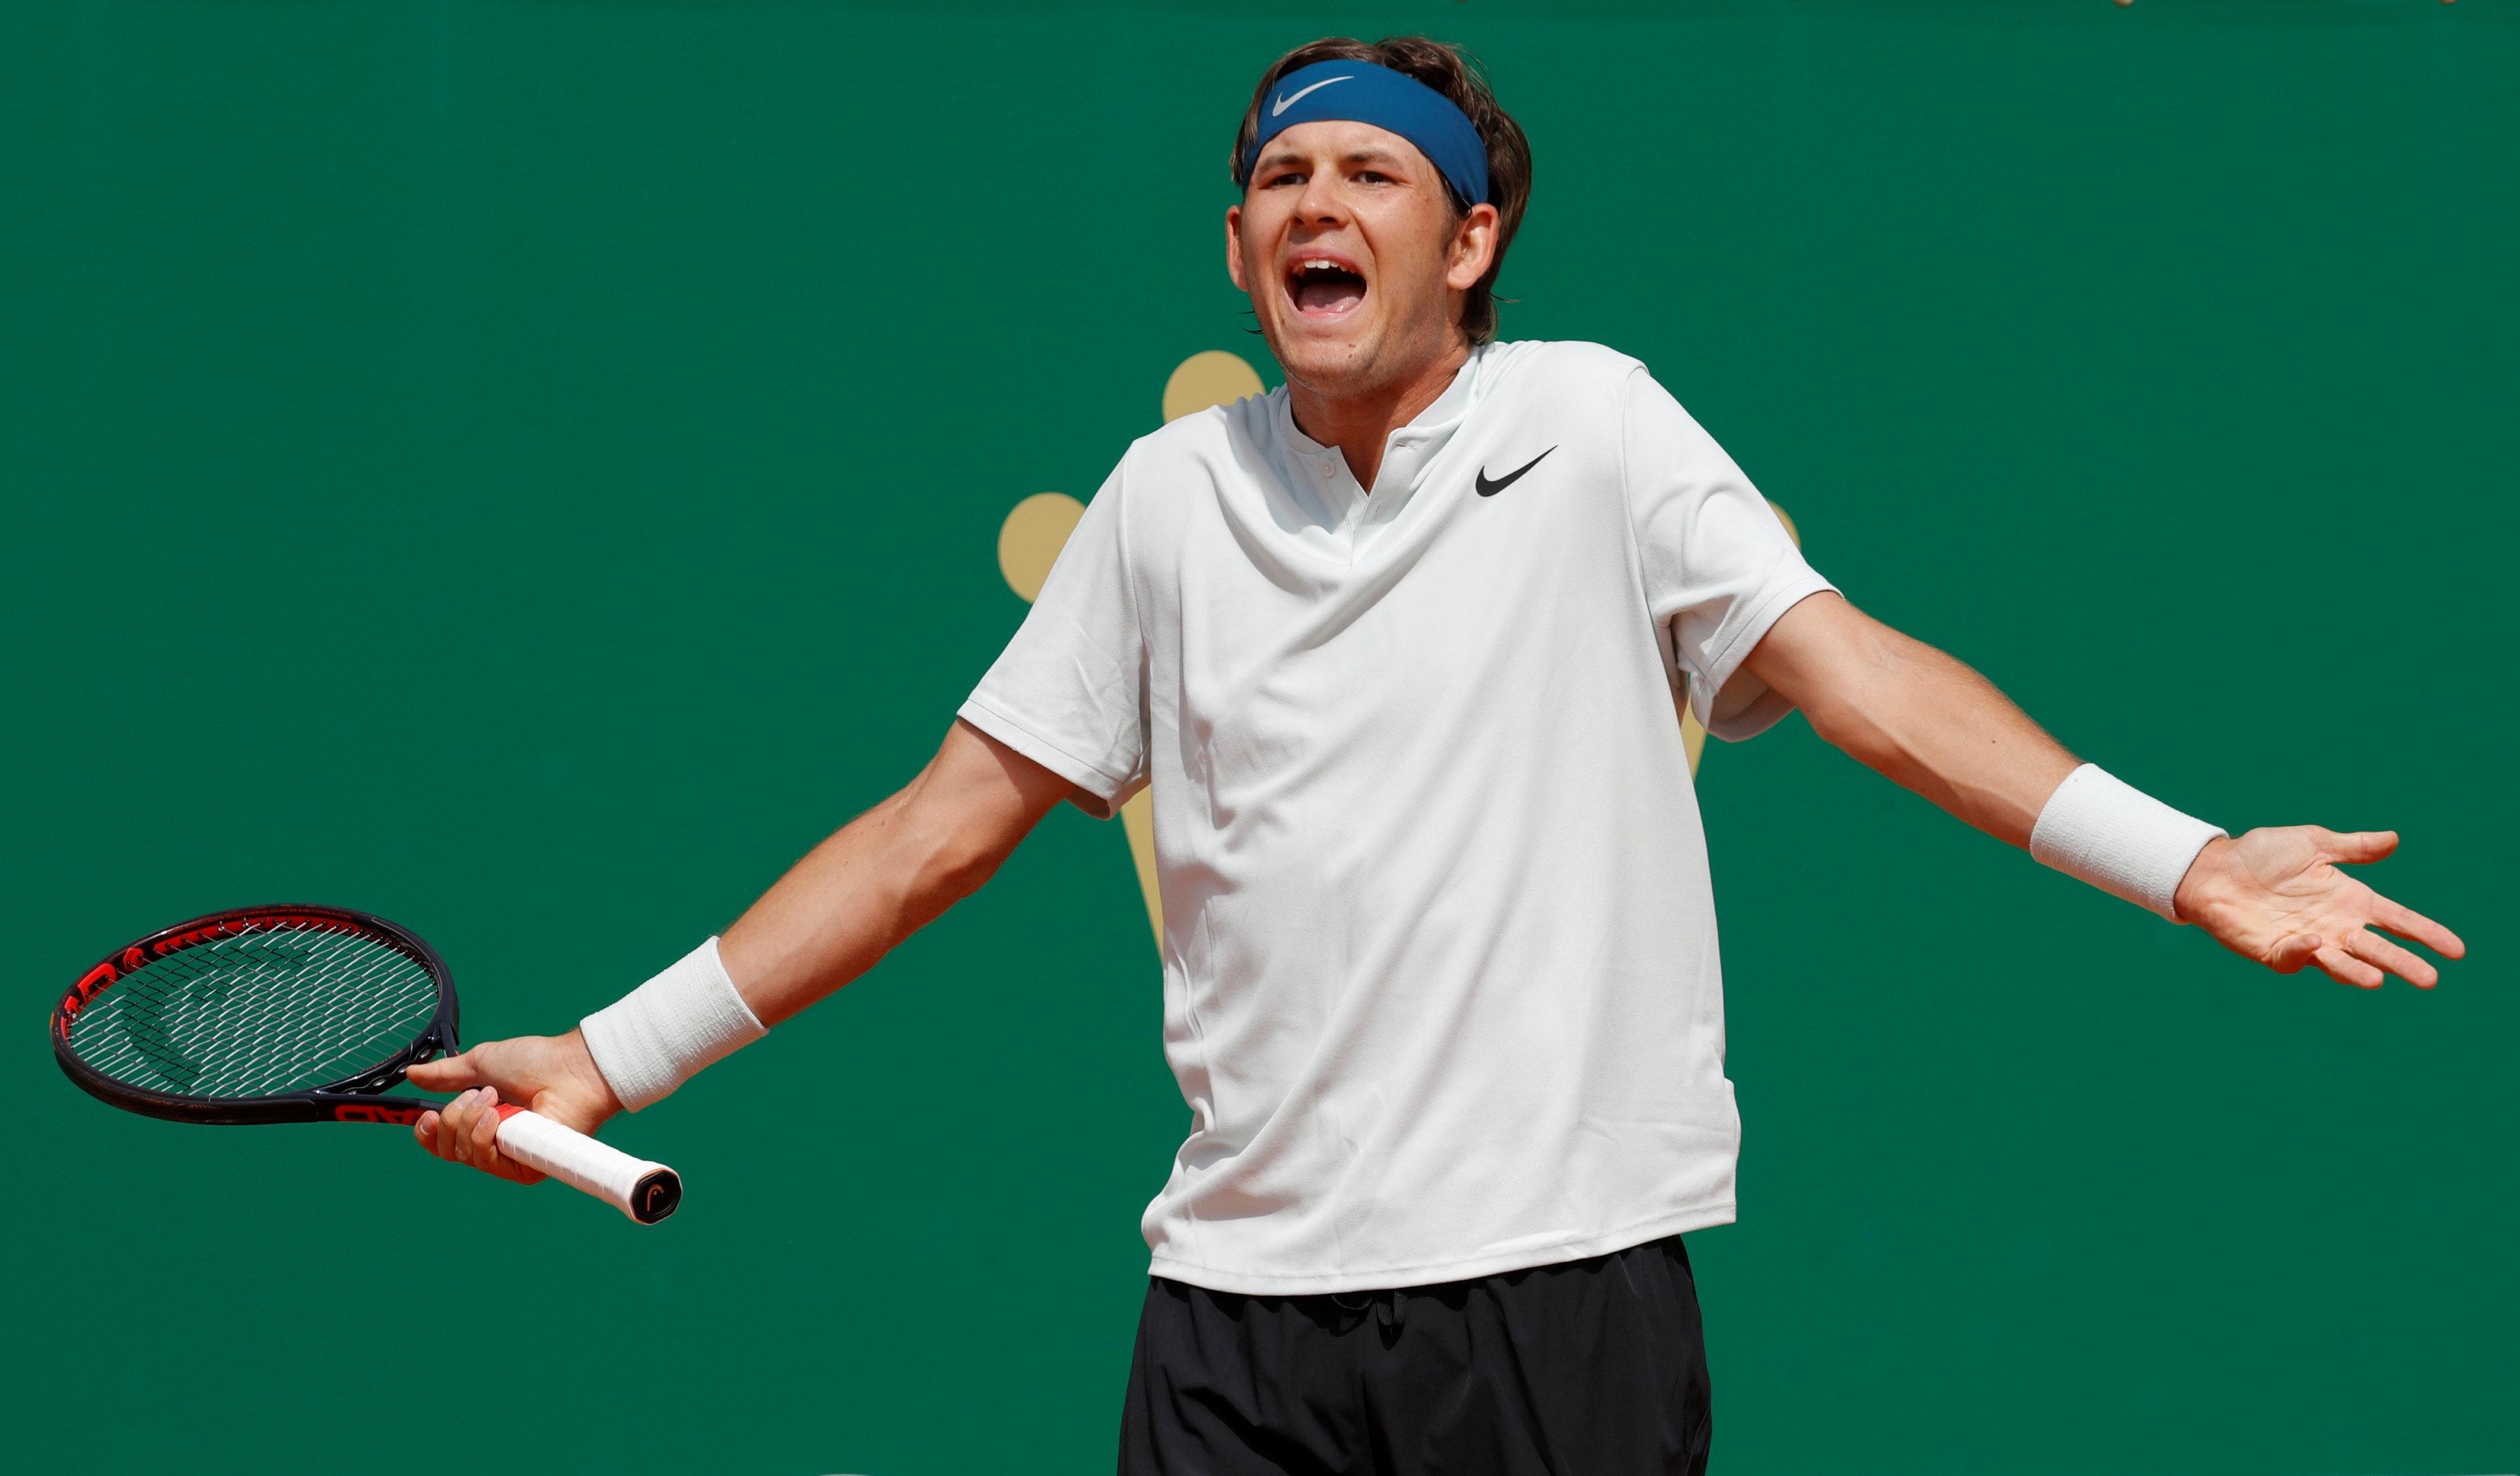 El tenista estadounidense Jared Donaldsonmostró su furia contra el juez de silla(Reuters)